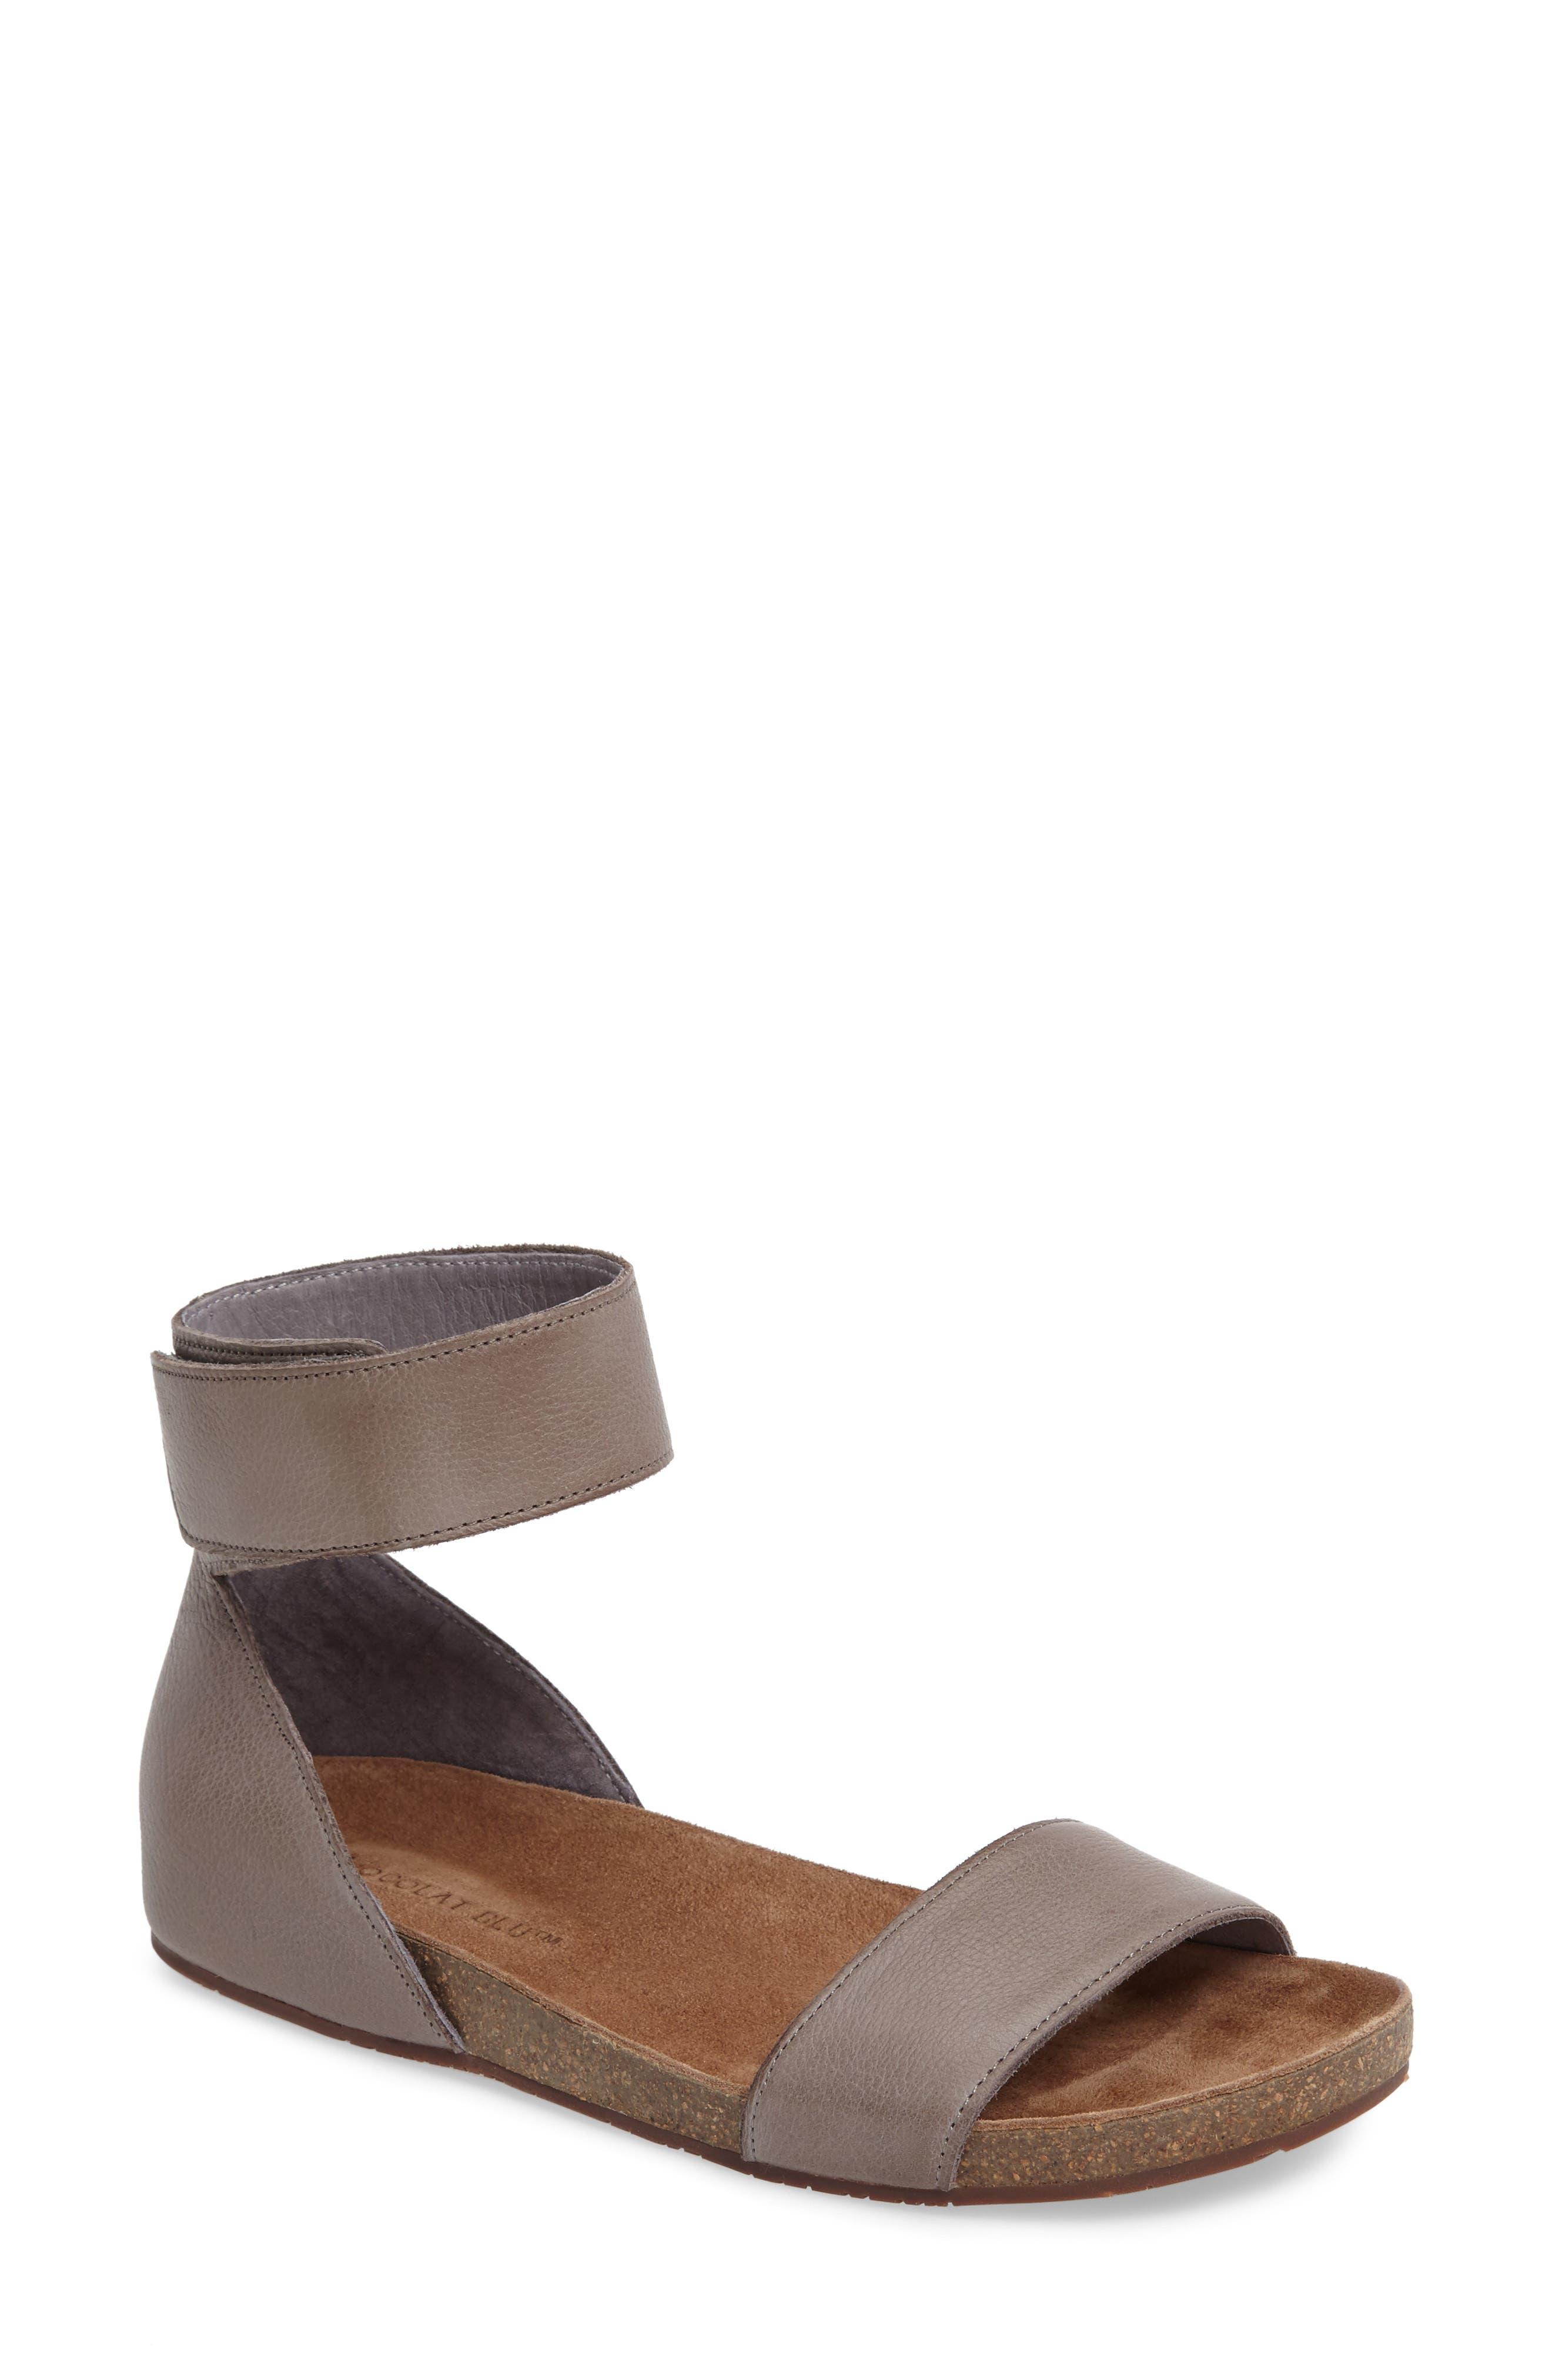 Chocolat Blu York Ankle Strap Sandal, Grey